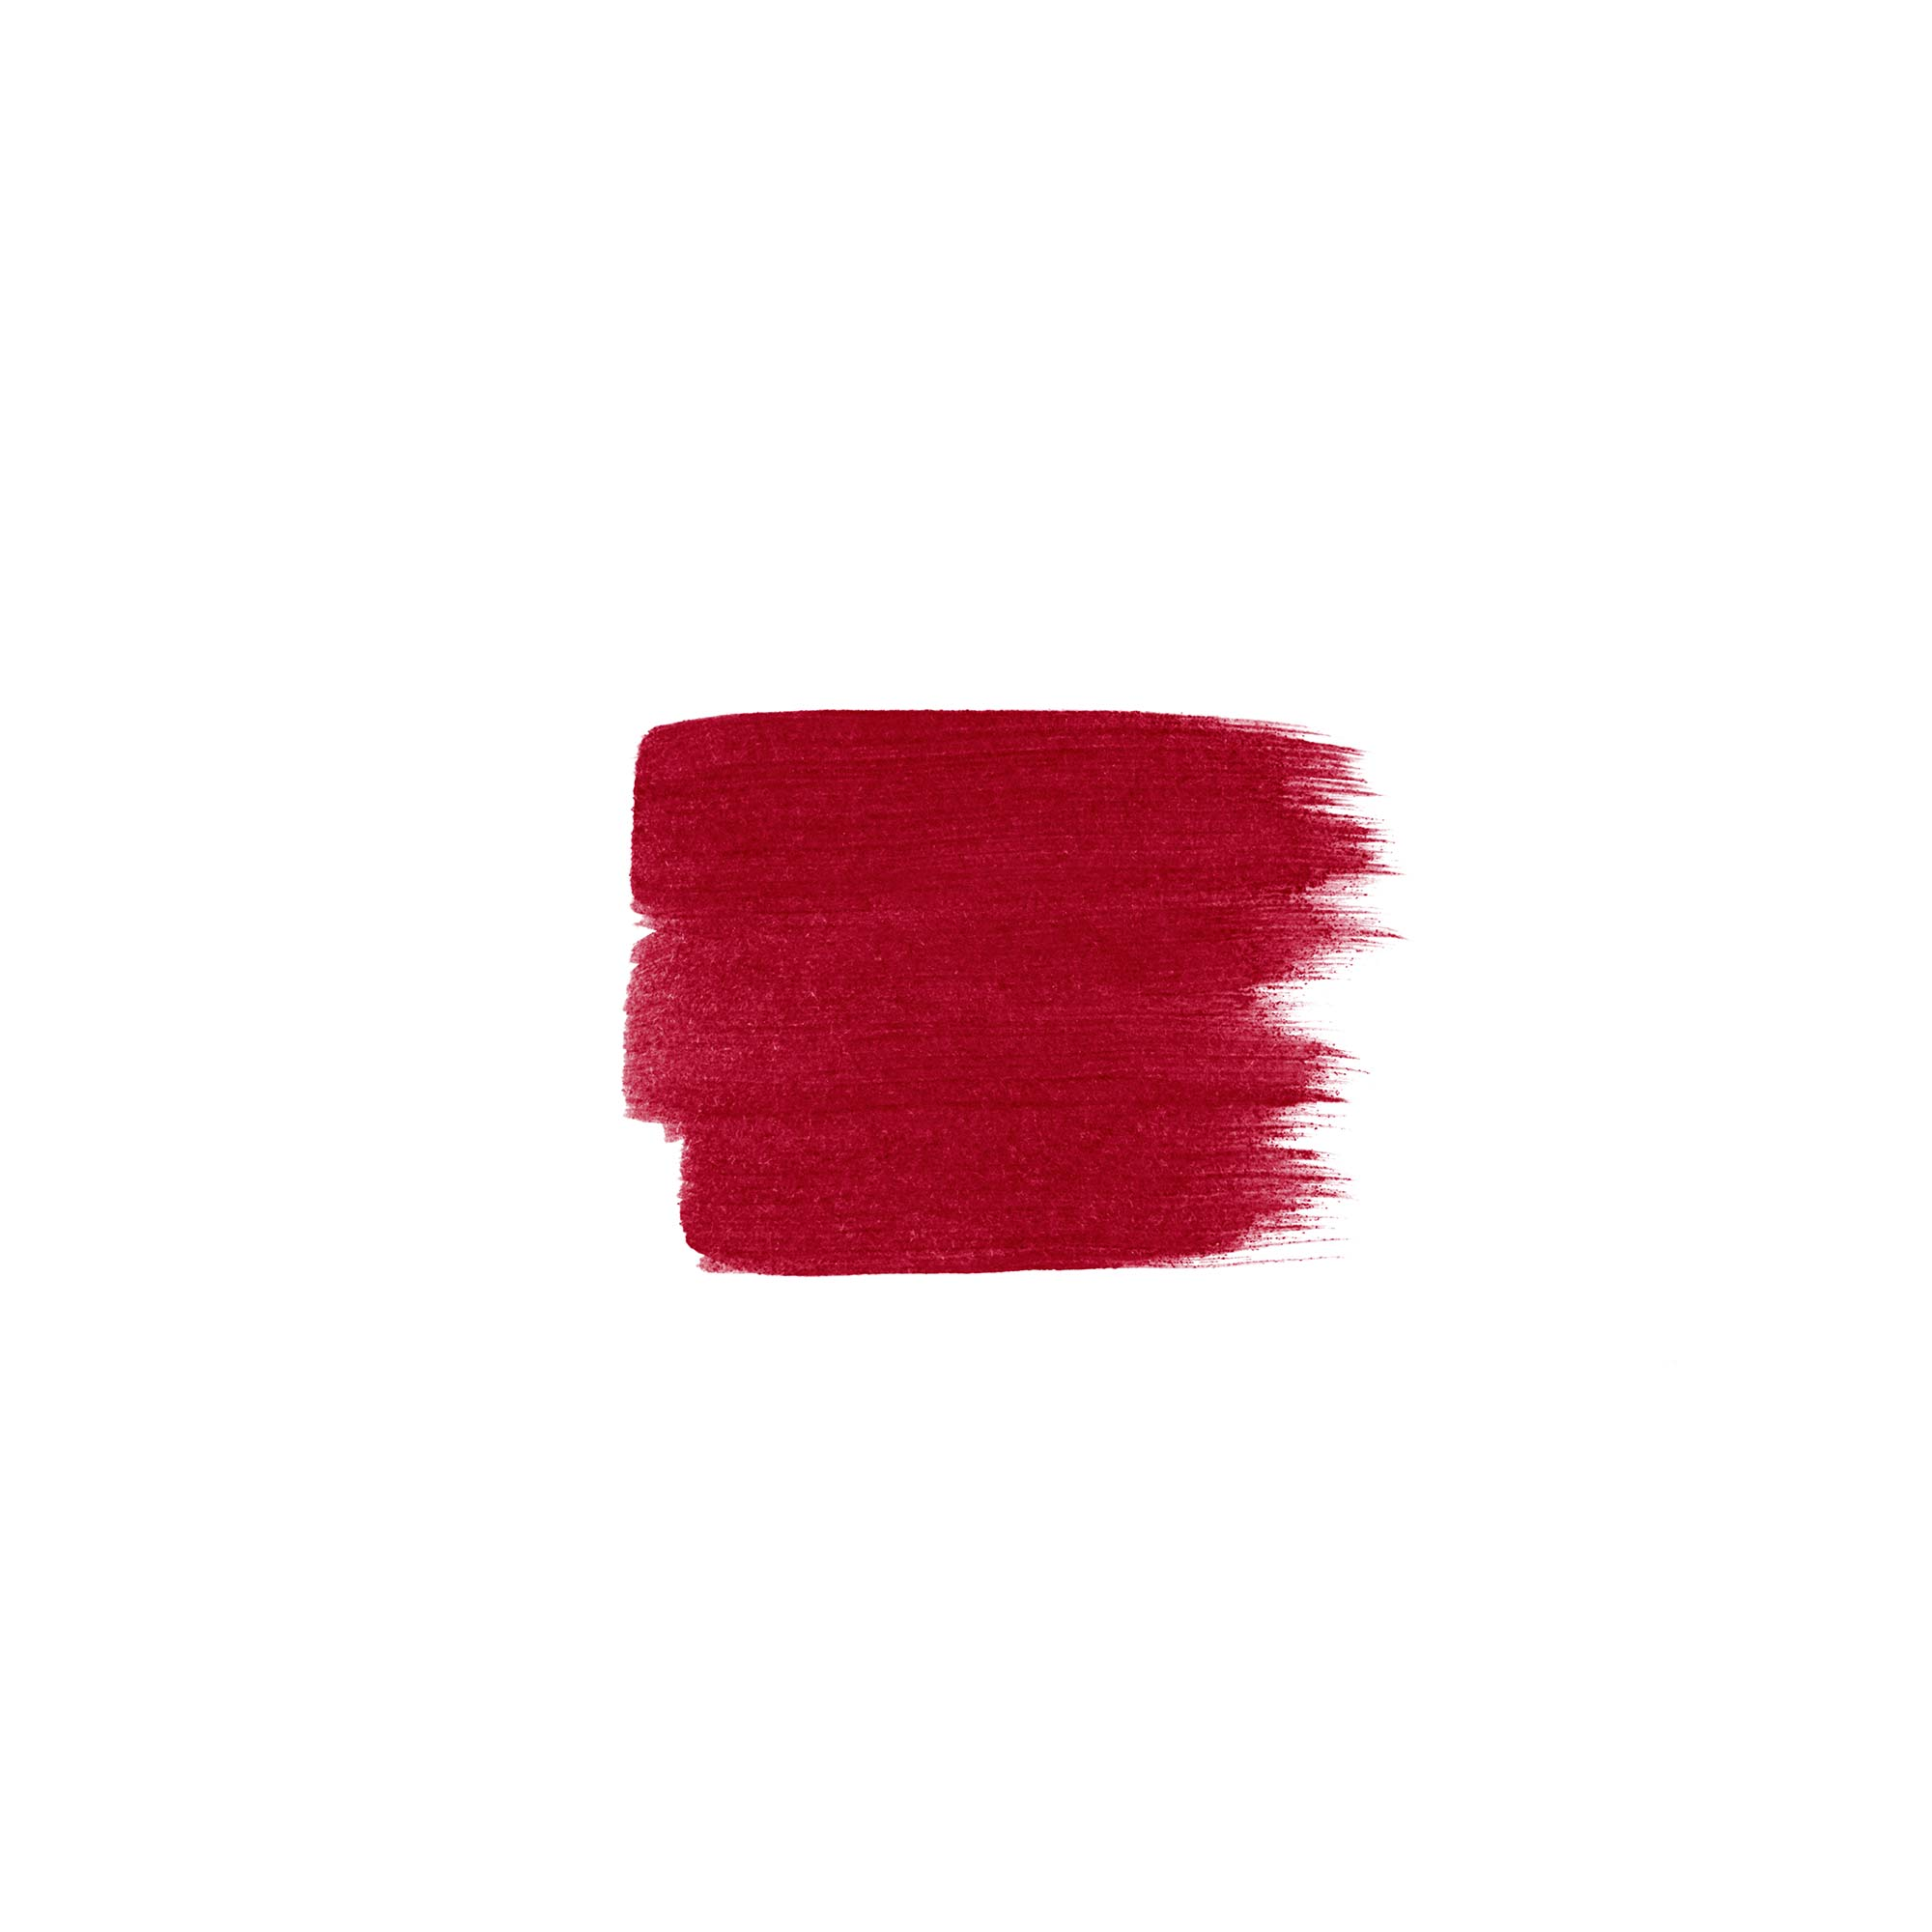 Lip Stain - Black Cherry